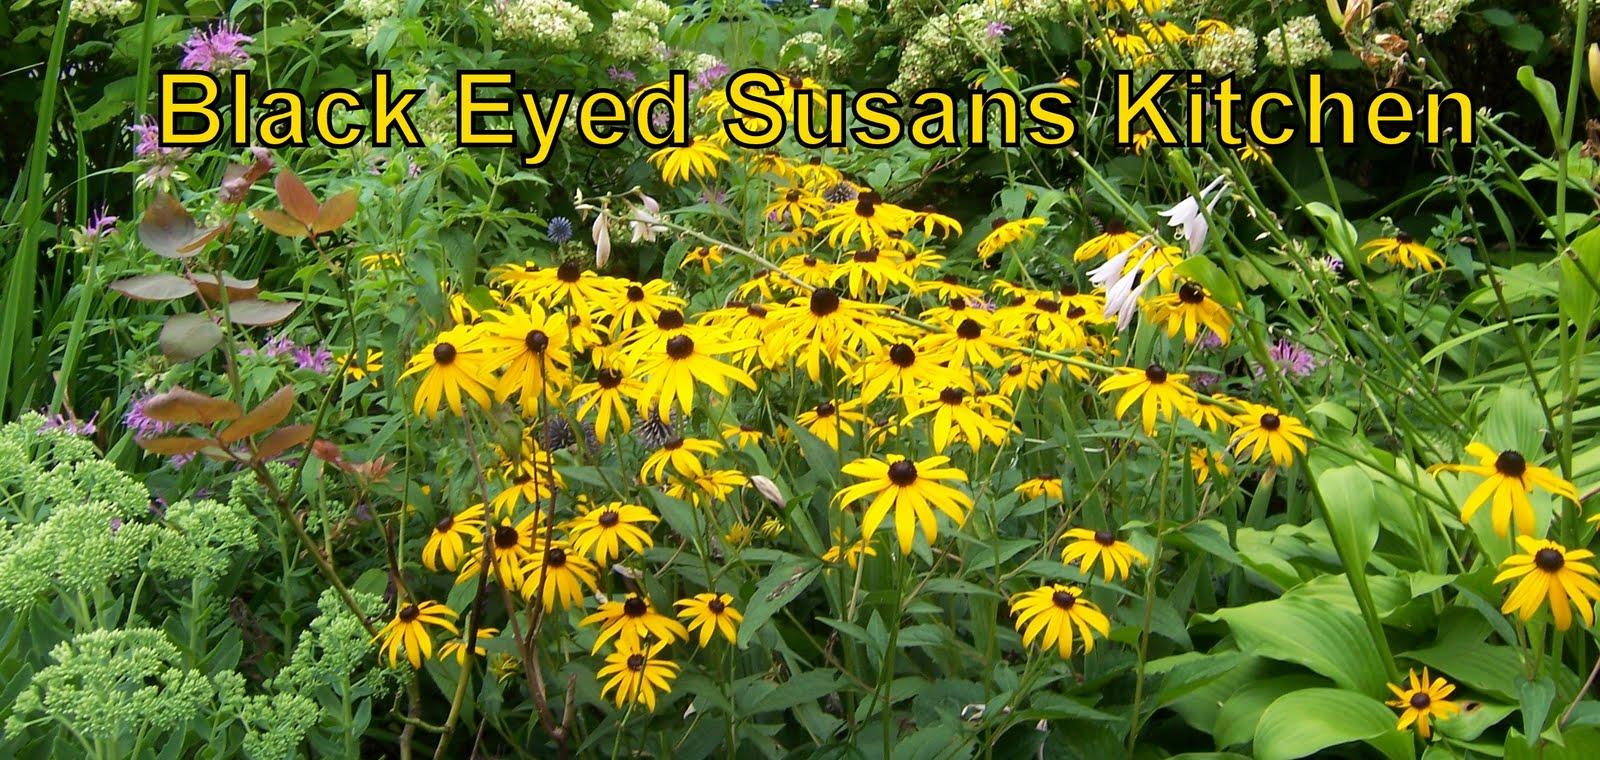 Black Eyed Susan's Kitchen